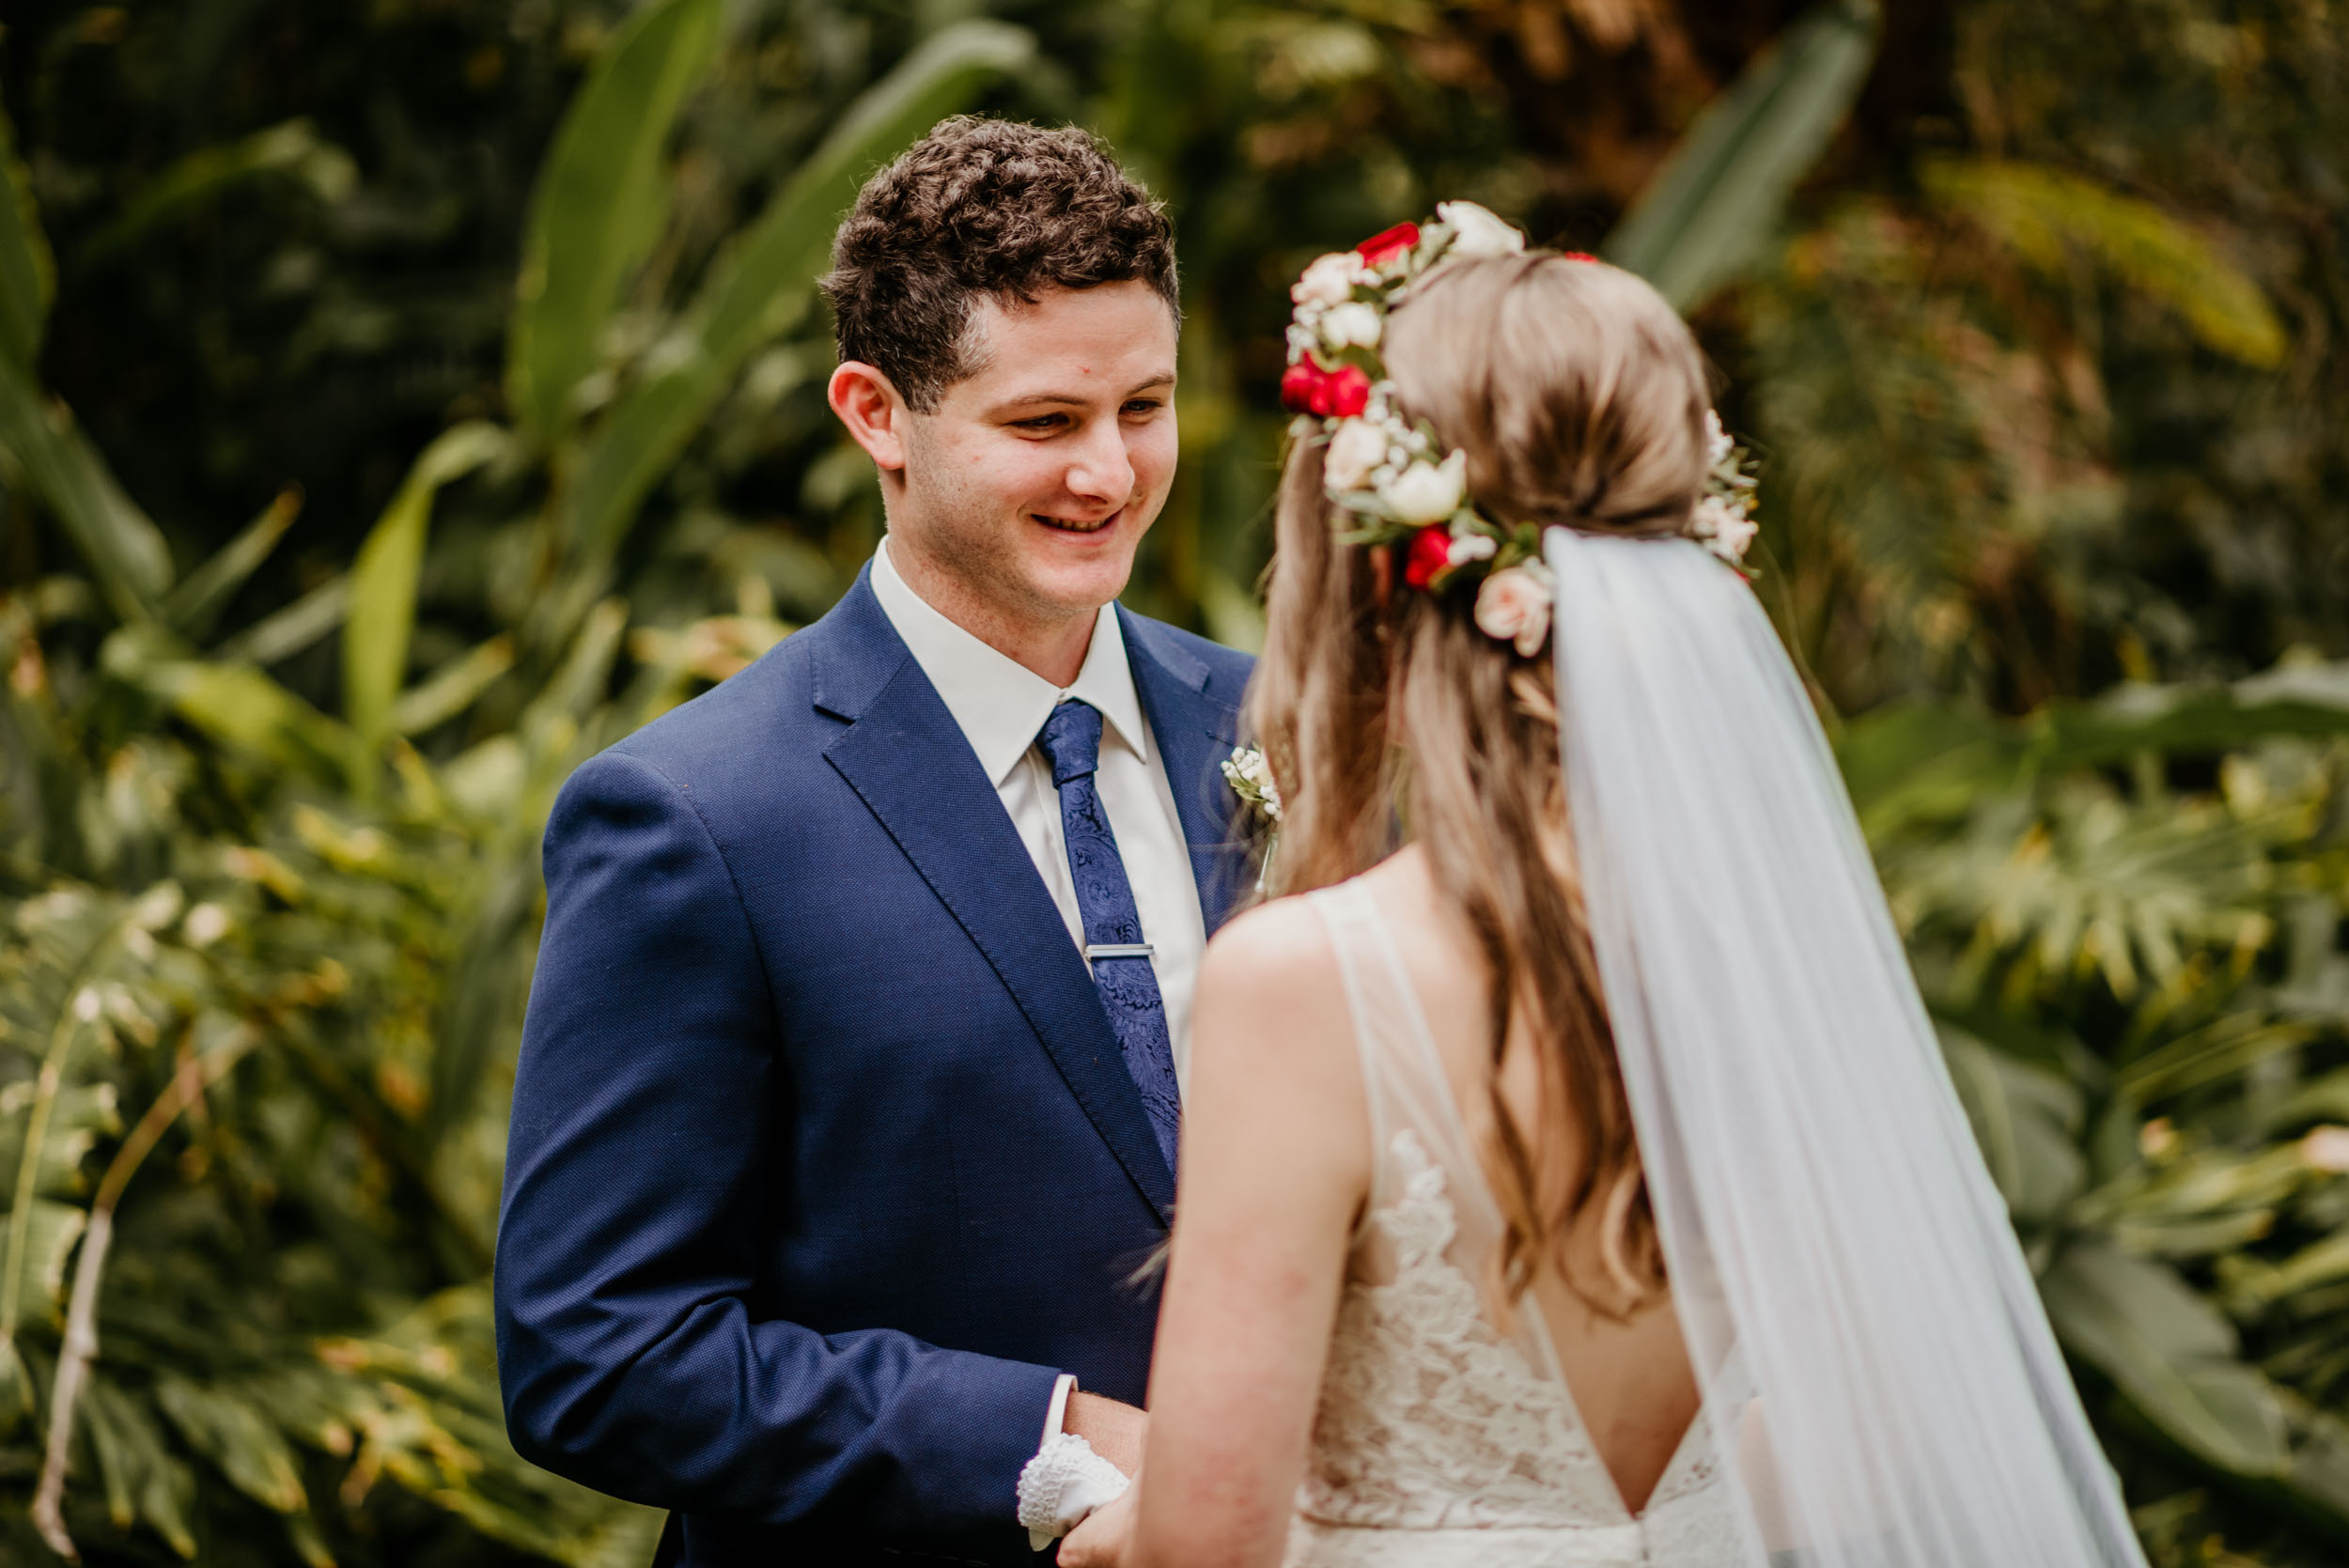 The Raw Photographer - Cairns Wedding Photographer - Laloli - Cairns Garden Ceremony - Cane Fields Photo Shoot-27.jpg